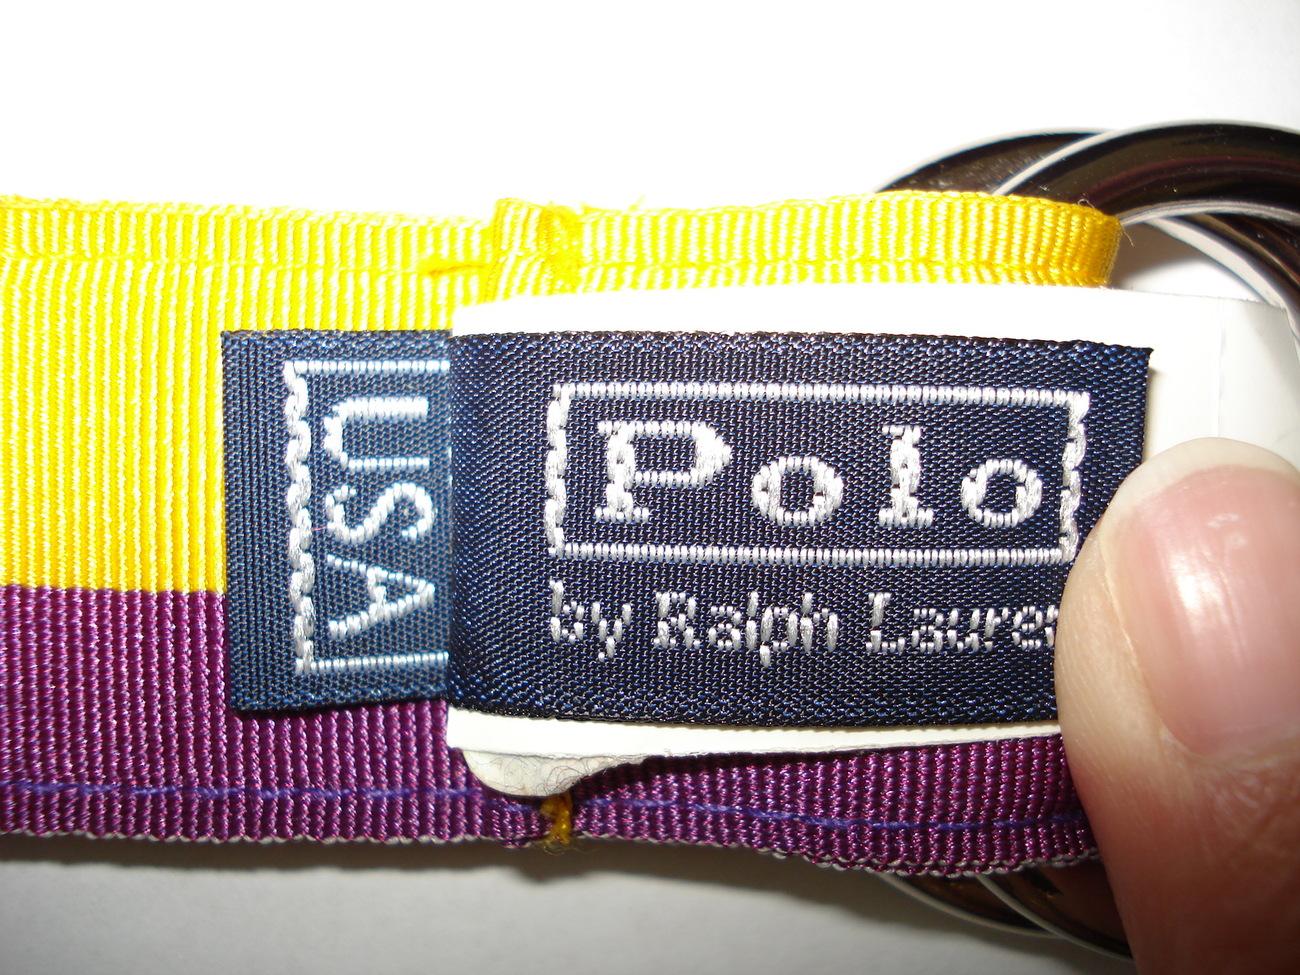 NWT Polo Ralph Lauren Grosgrain Ribbon Belt Size Small  Purple & Yellow